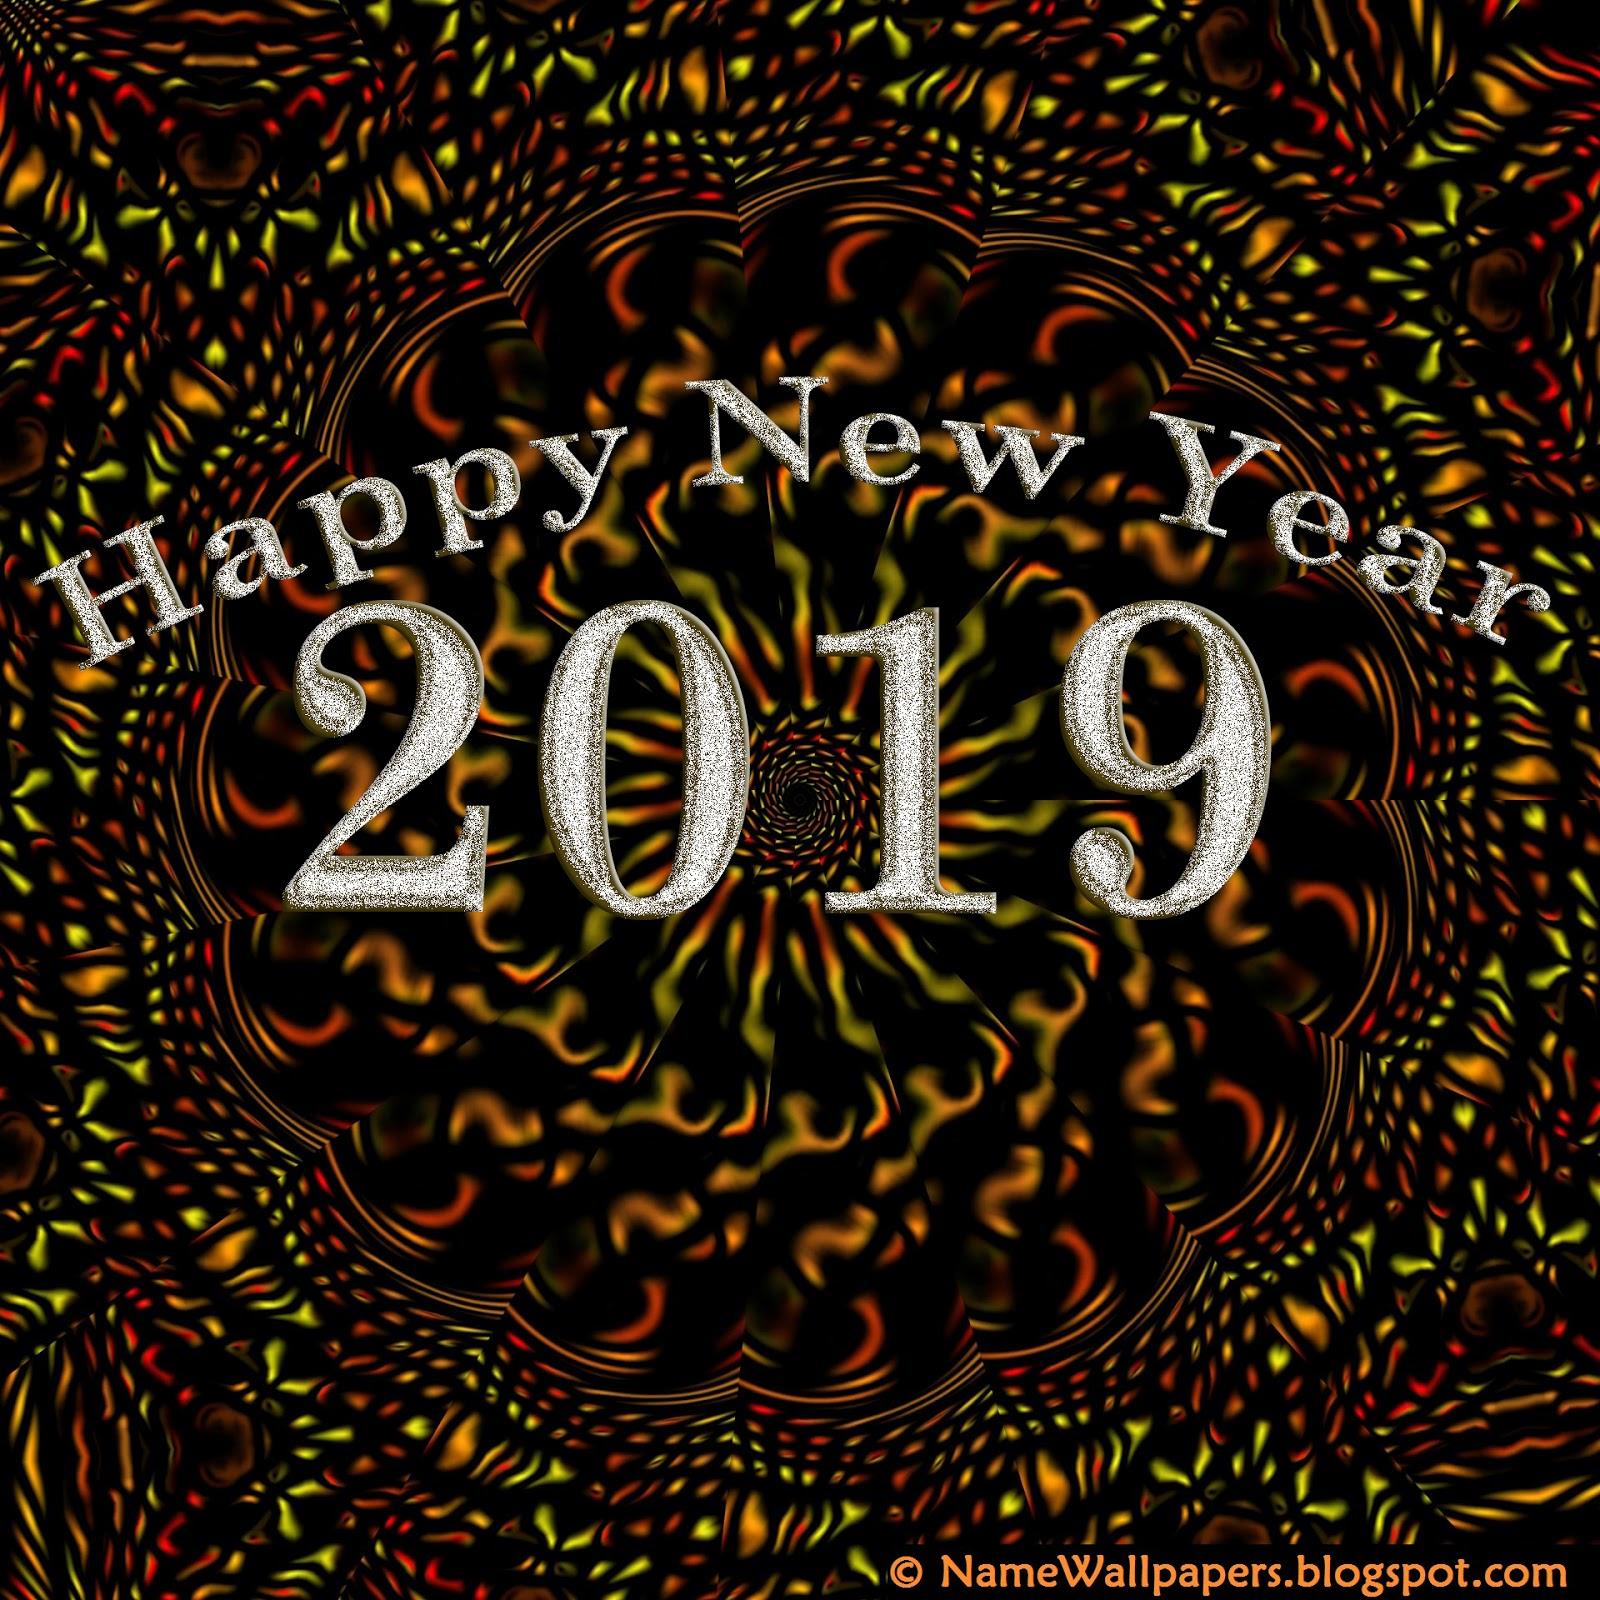 Happy New Year 2019 Images HD | Happy New Year 2019 Images